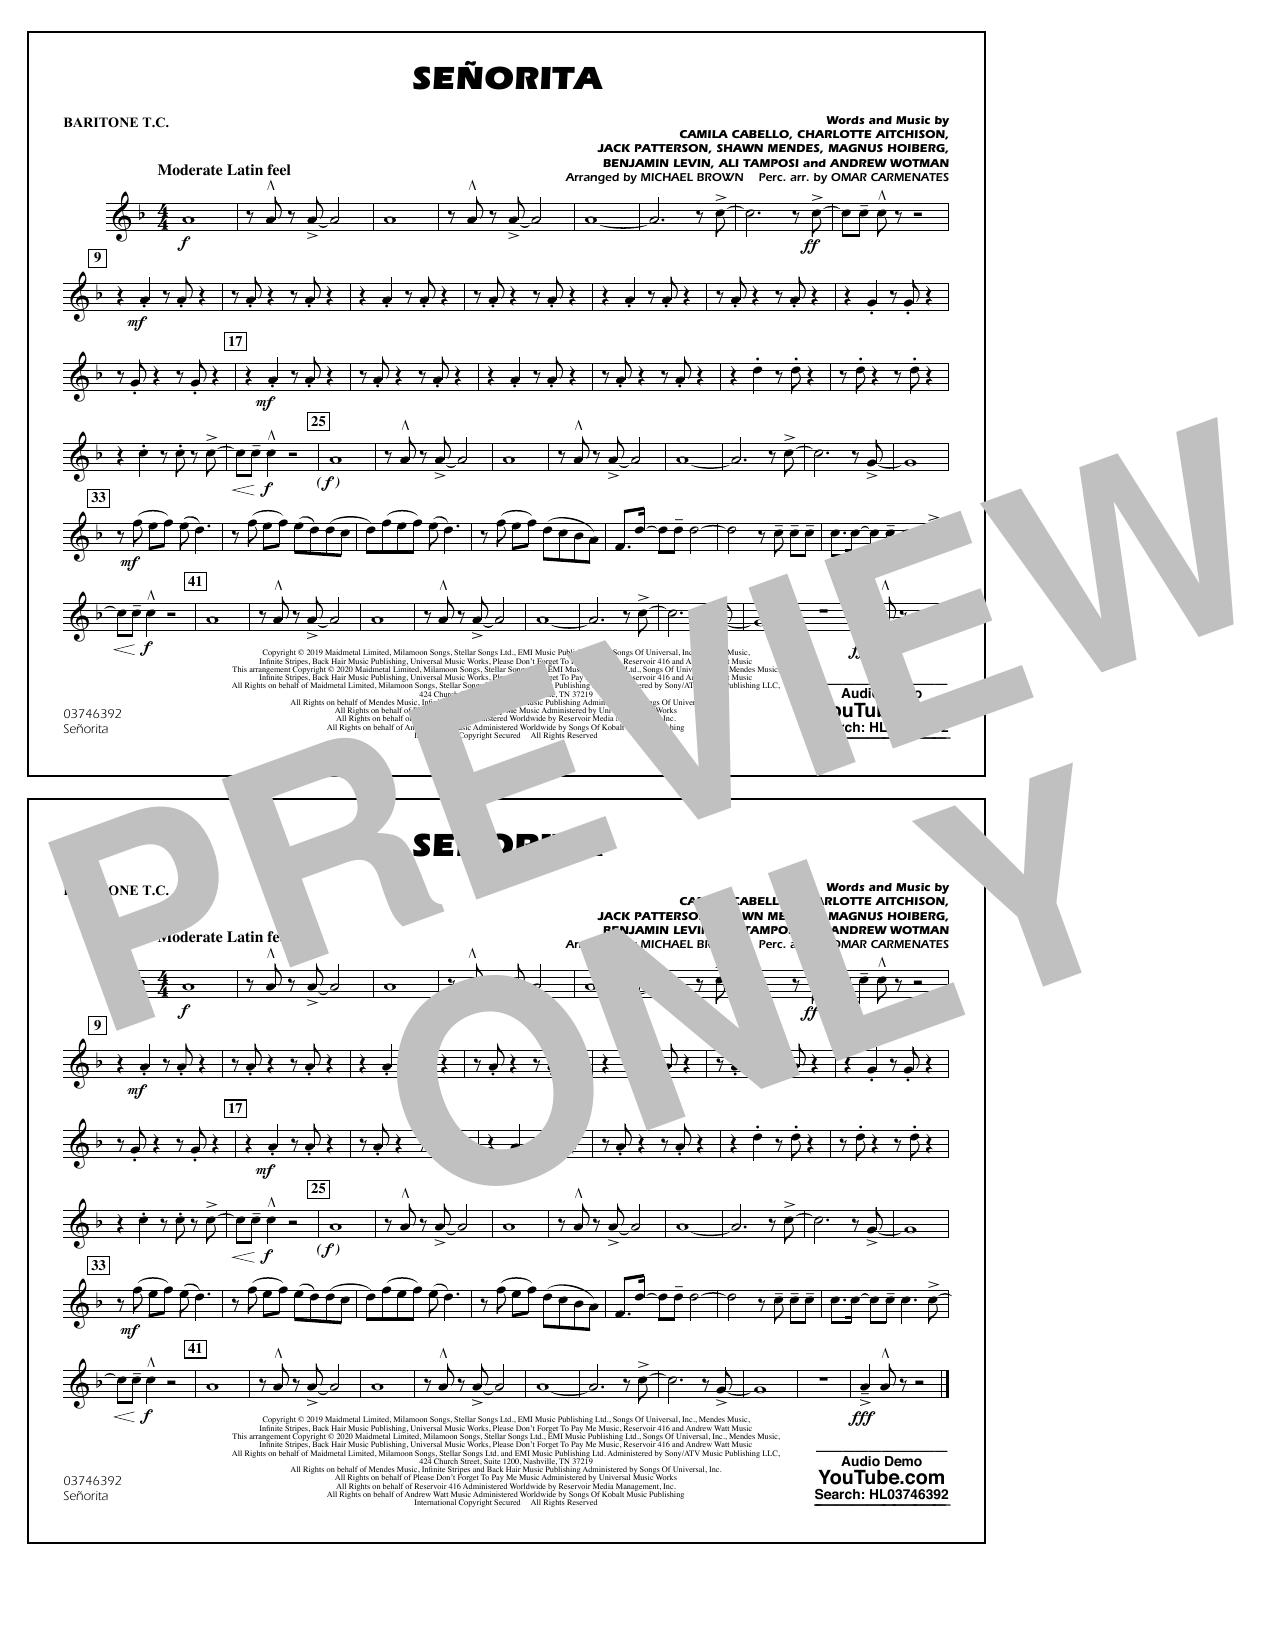 Shawn Mendes & Camila Cabello Señorita (arr. Carmenates and Brown) - Baritone T.C. sheet music notes and chords. Download Printable PDF.